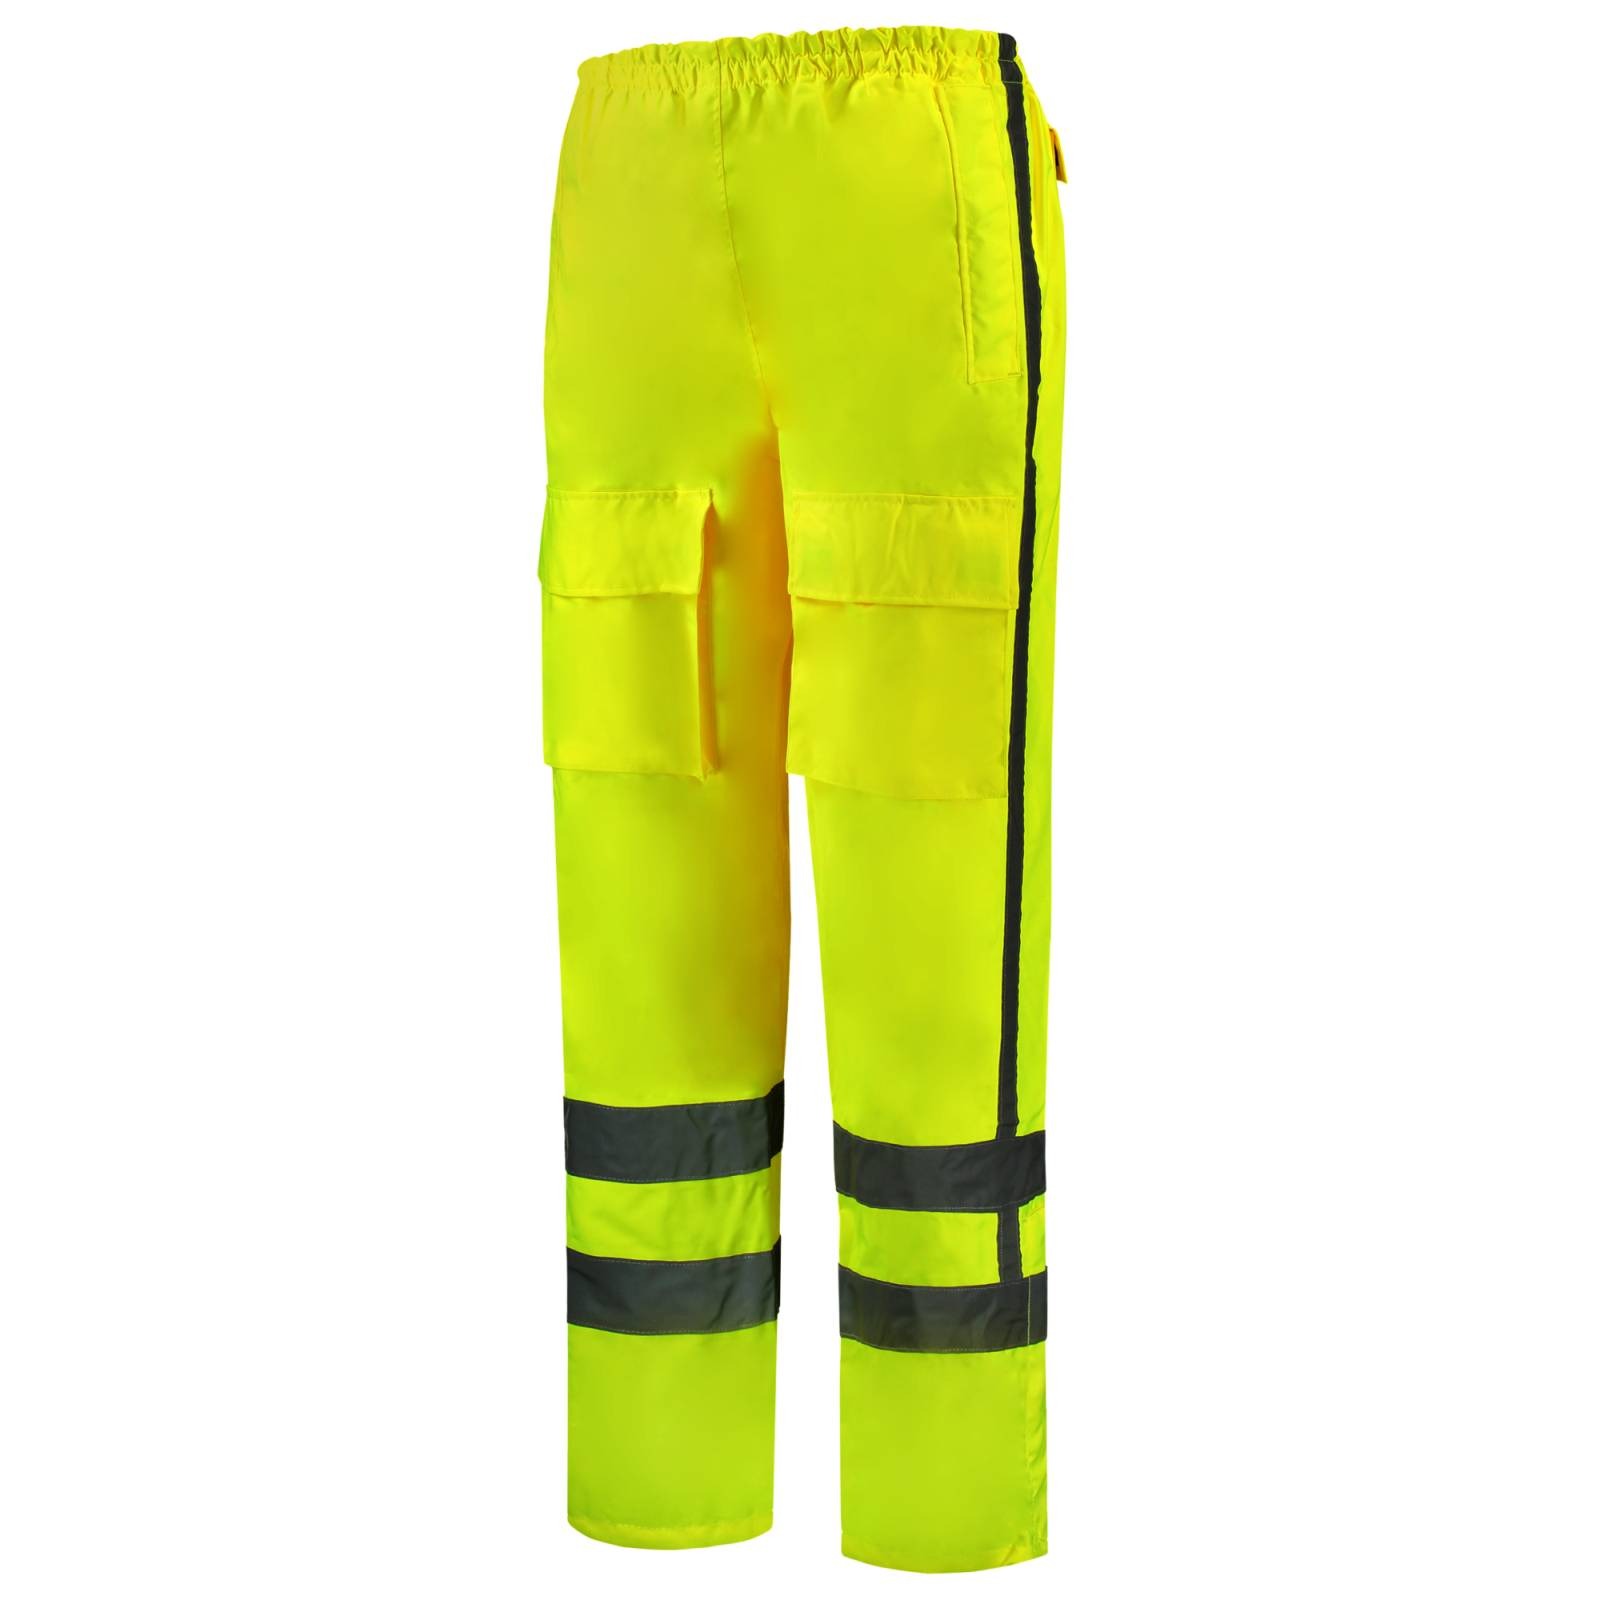 Tricorp Safety Broeken 503001-TPA3001 High Vis- RWS fluo-geel(Yellow)